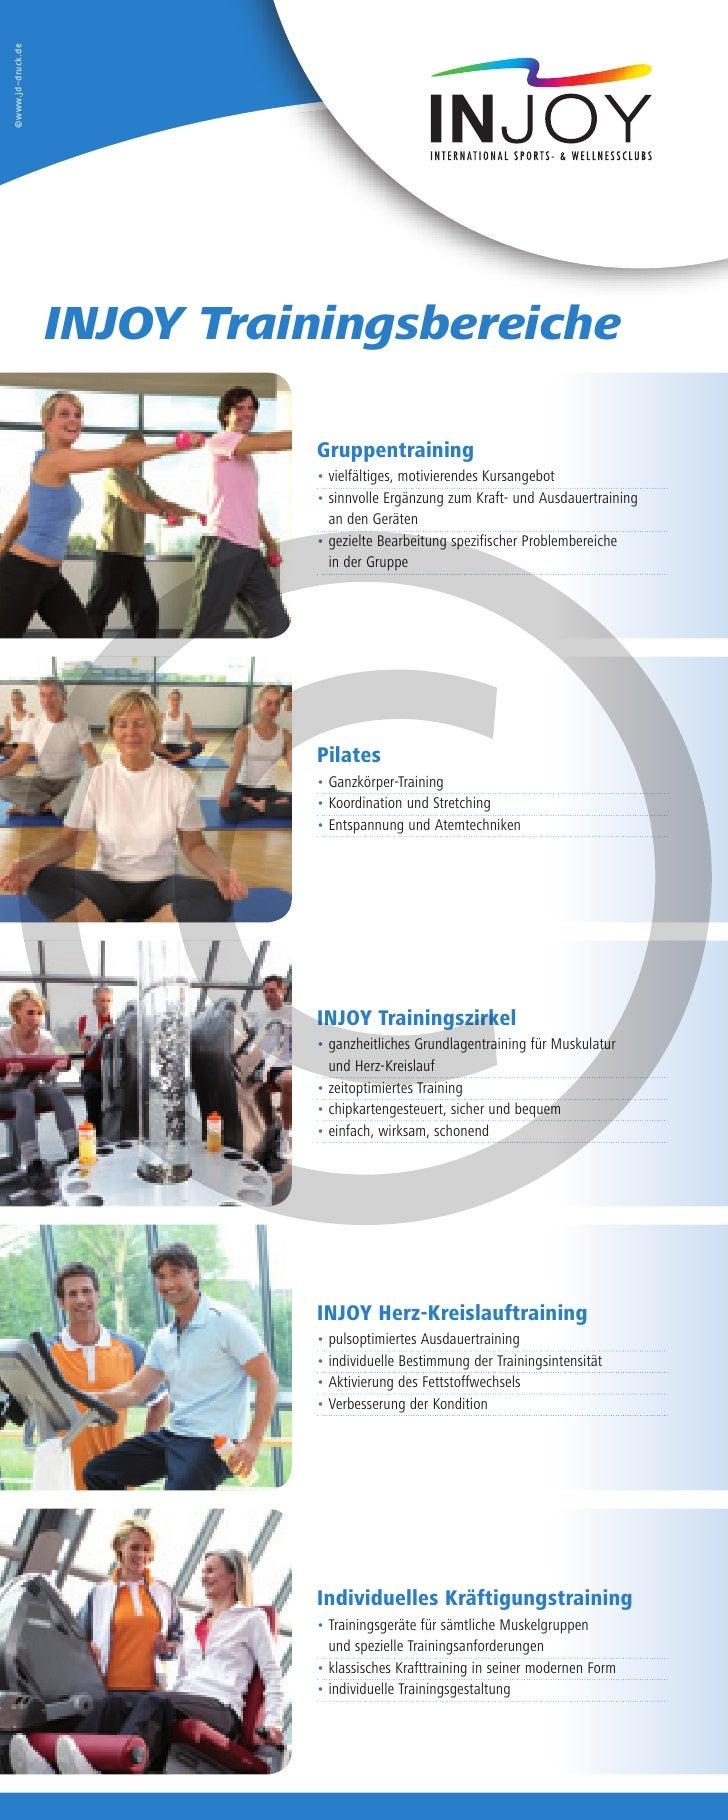 ©www.jd-druck.de                   INJOY Trainingsbereiche                             Gruppentraining                    ...